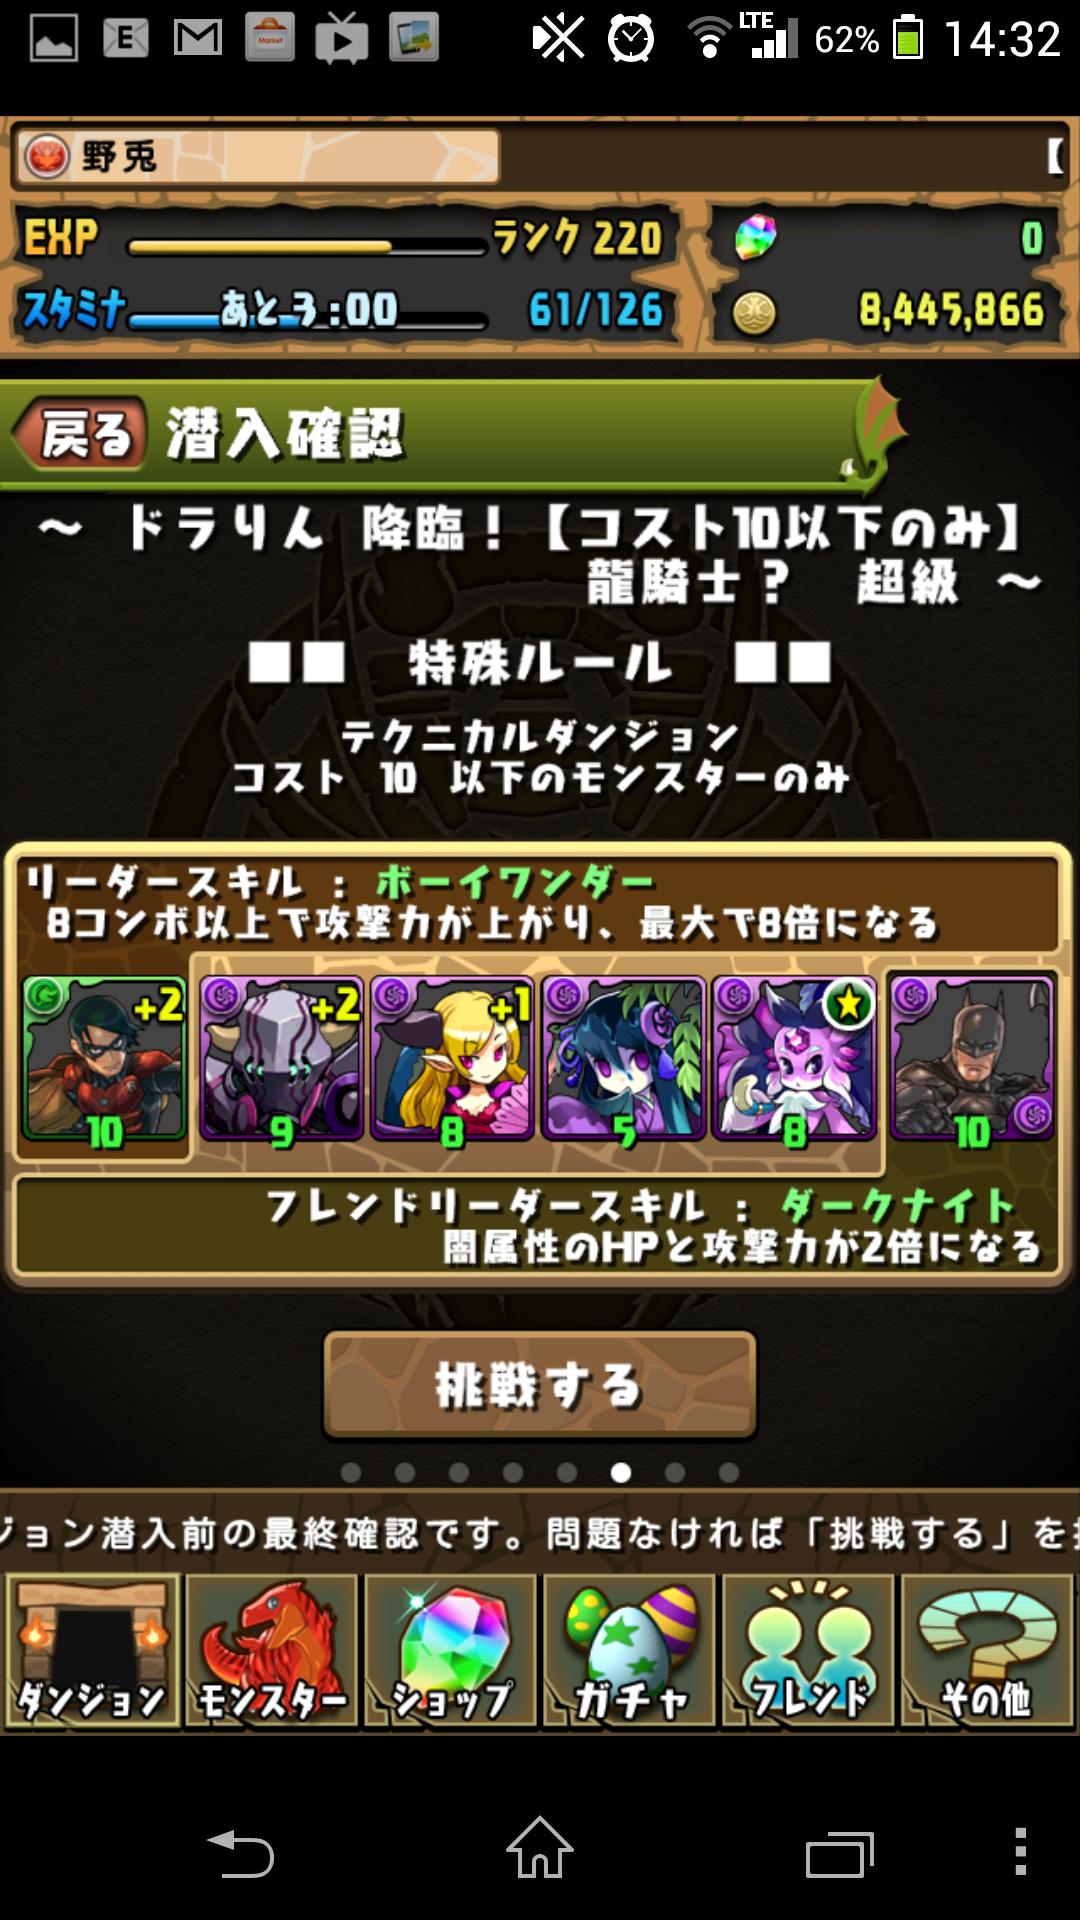 Screenshot_2014-04-01-14-32-13.png